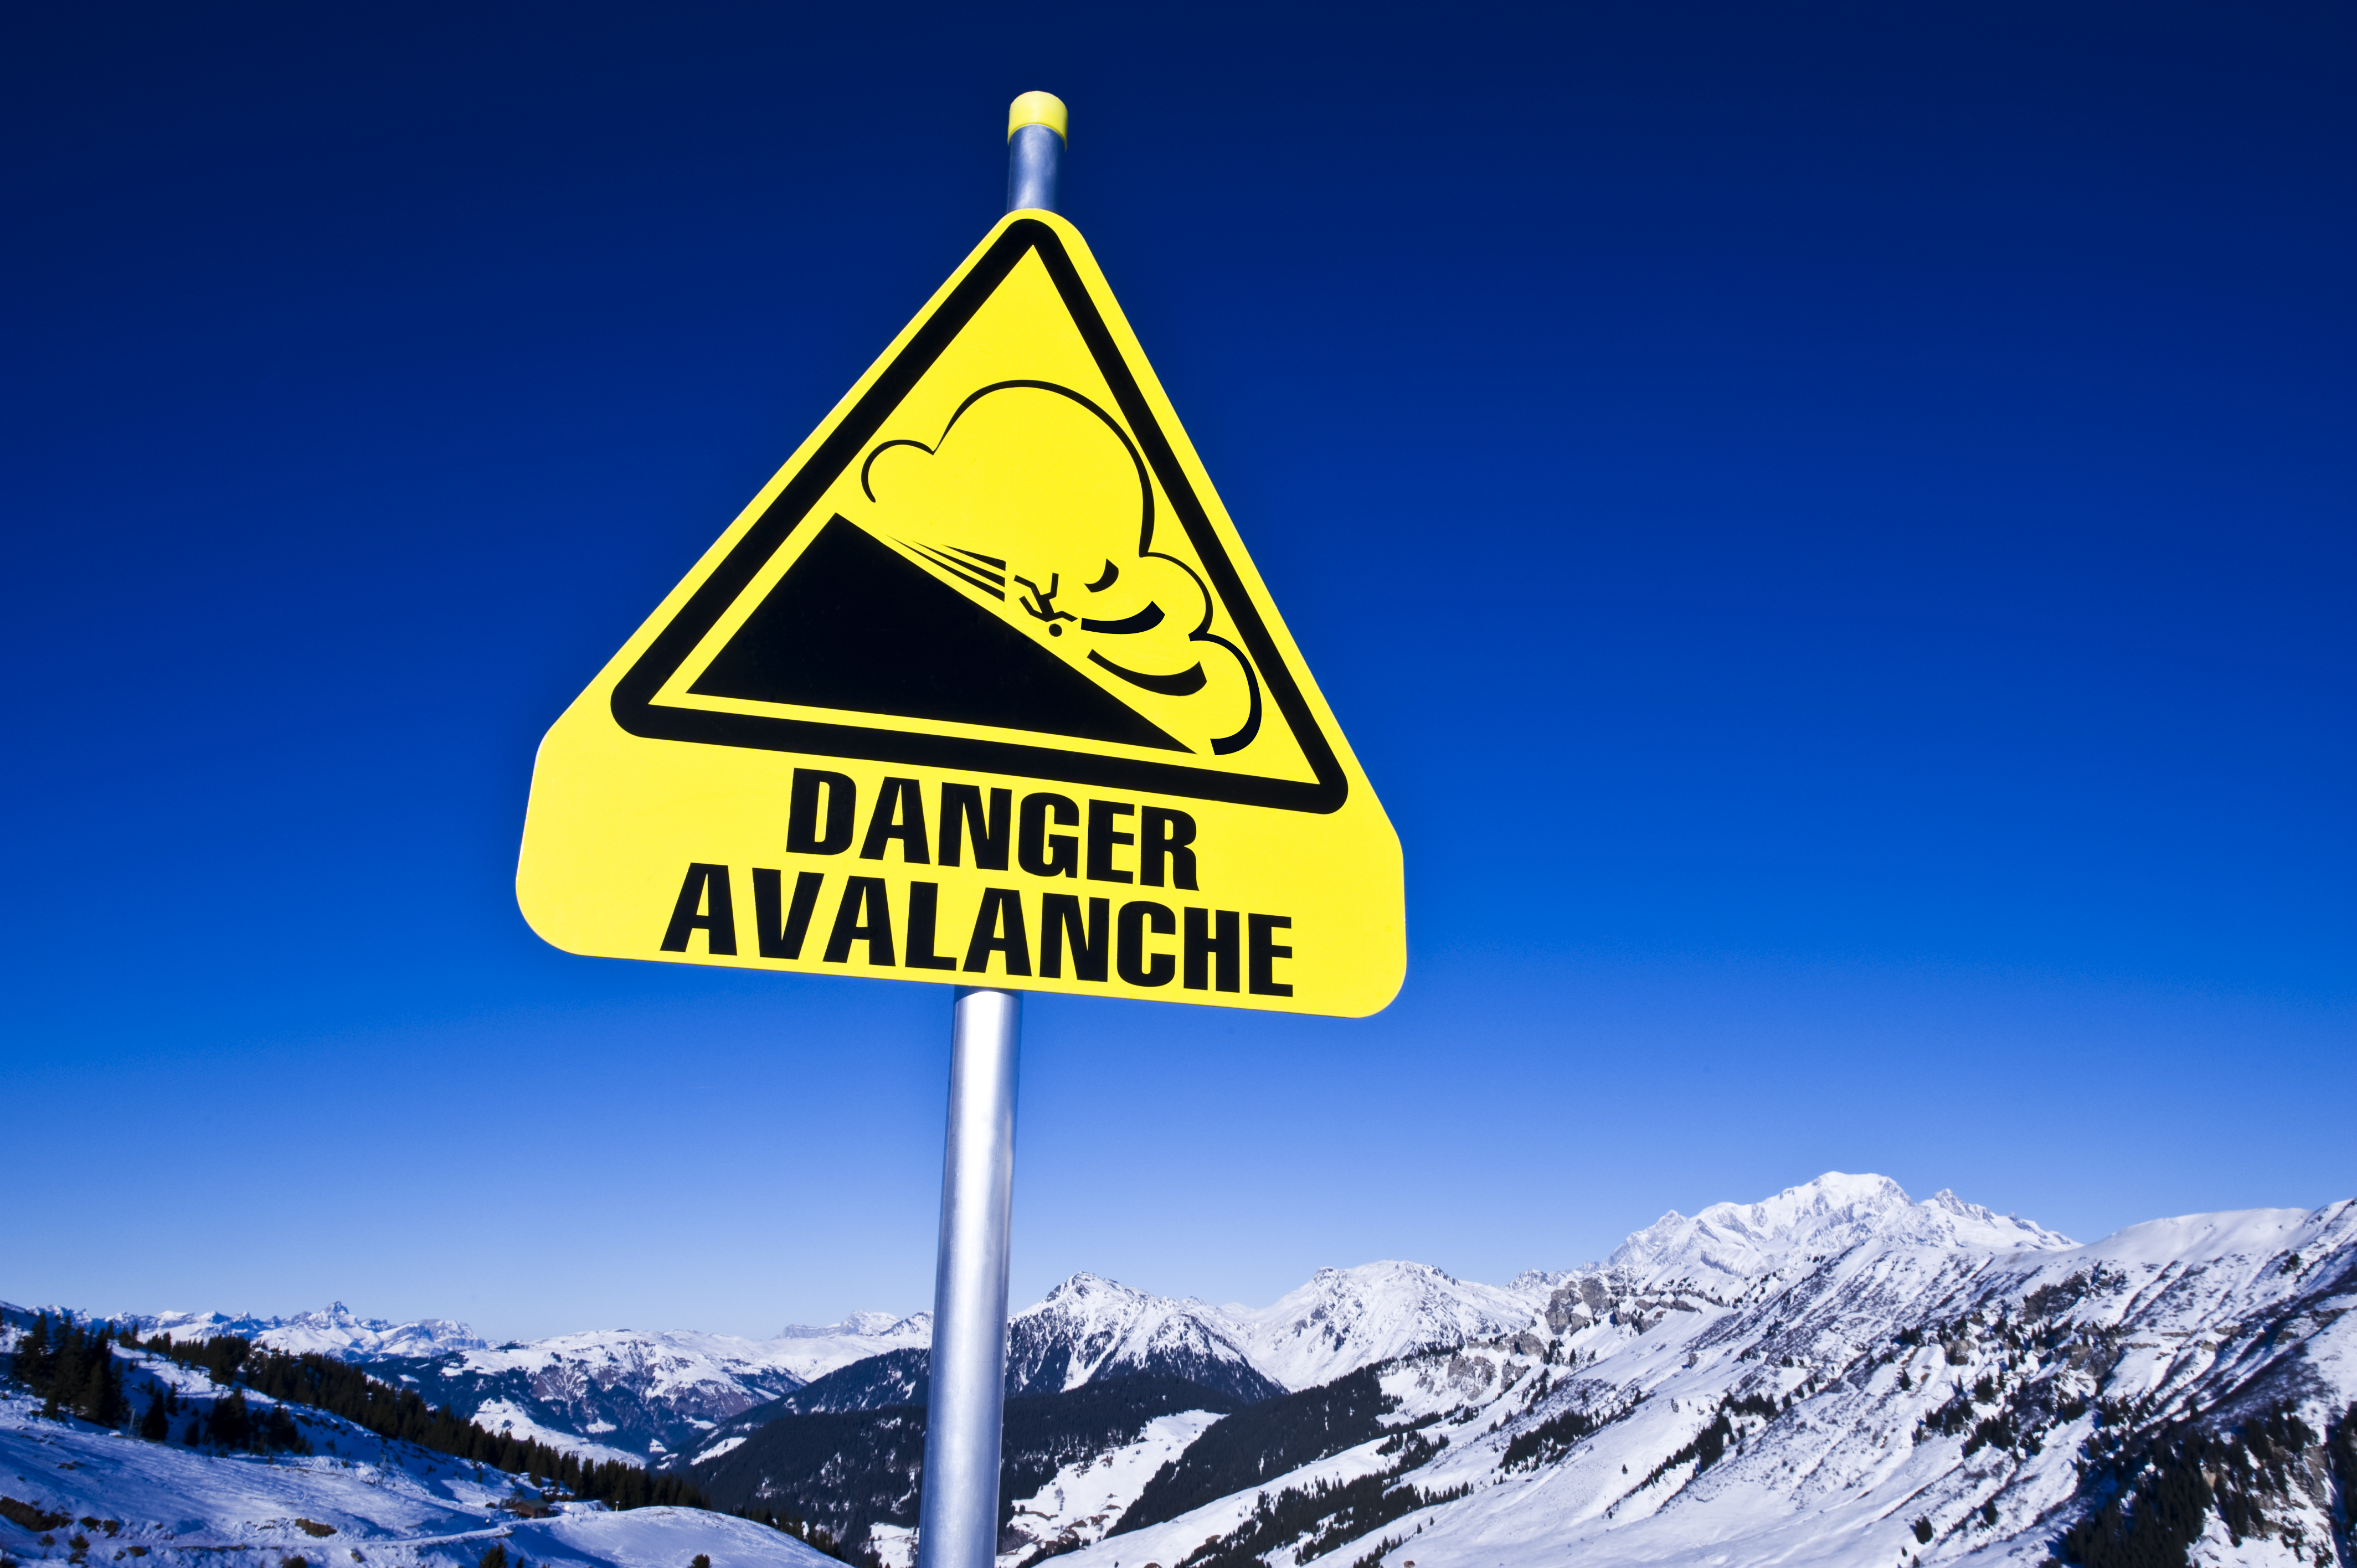 Danger Avalanche sign